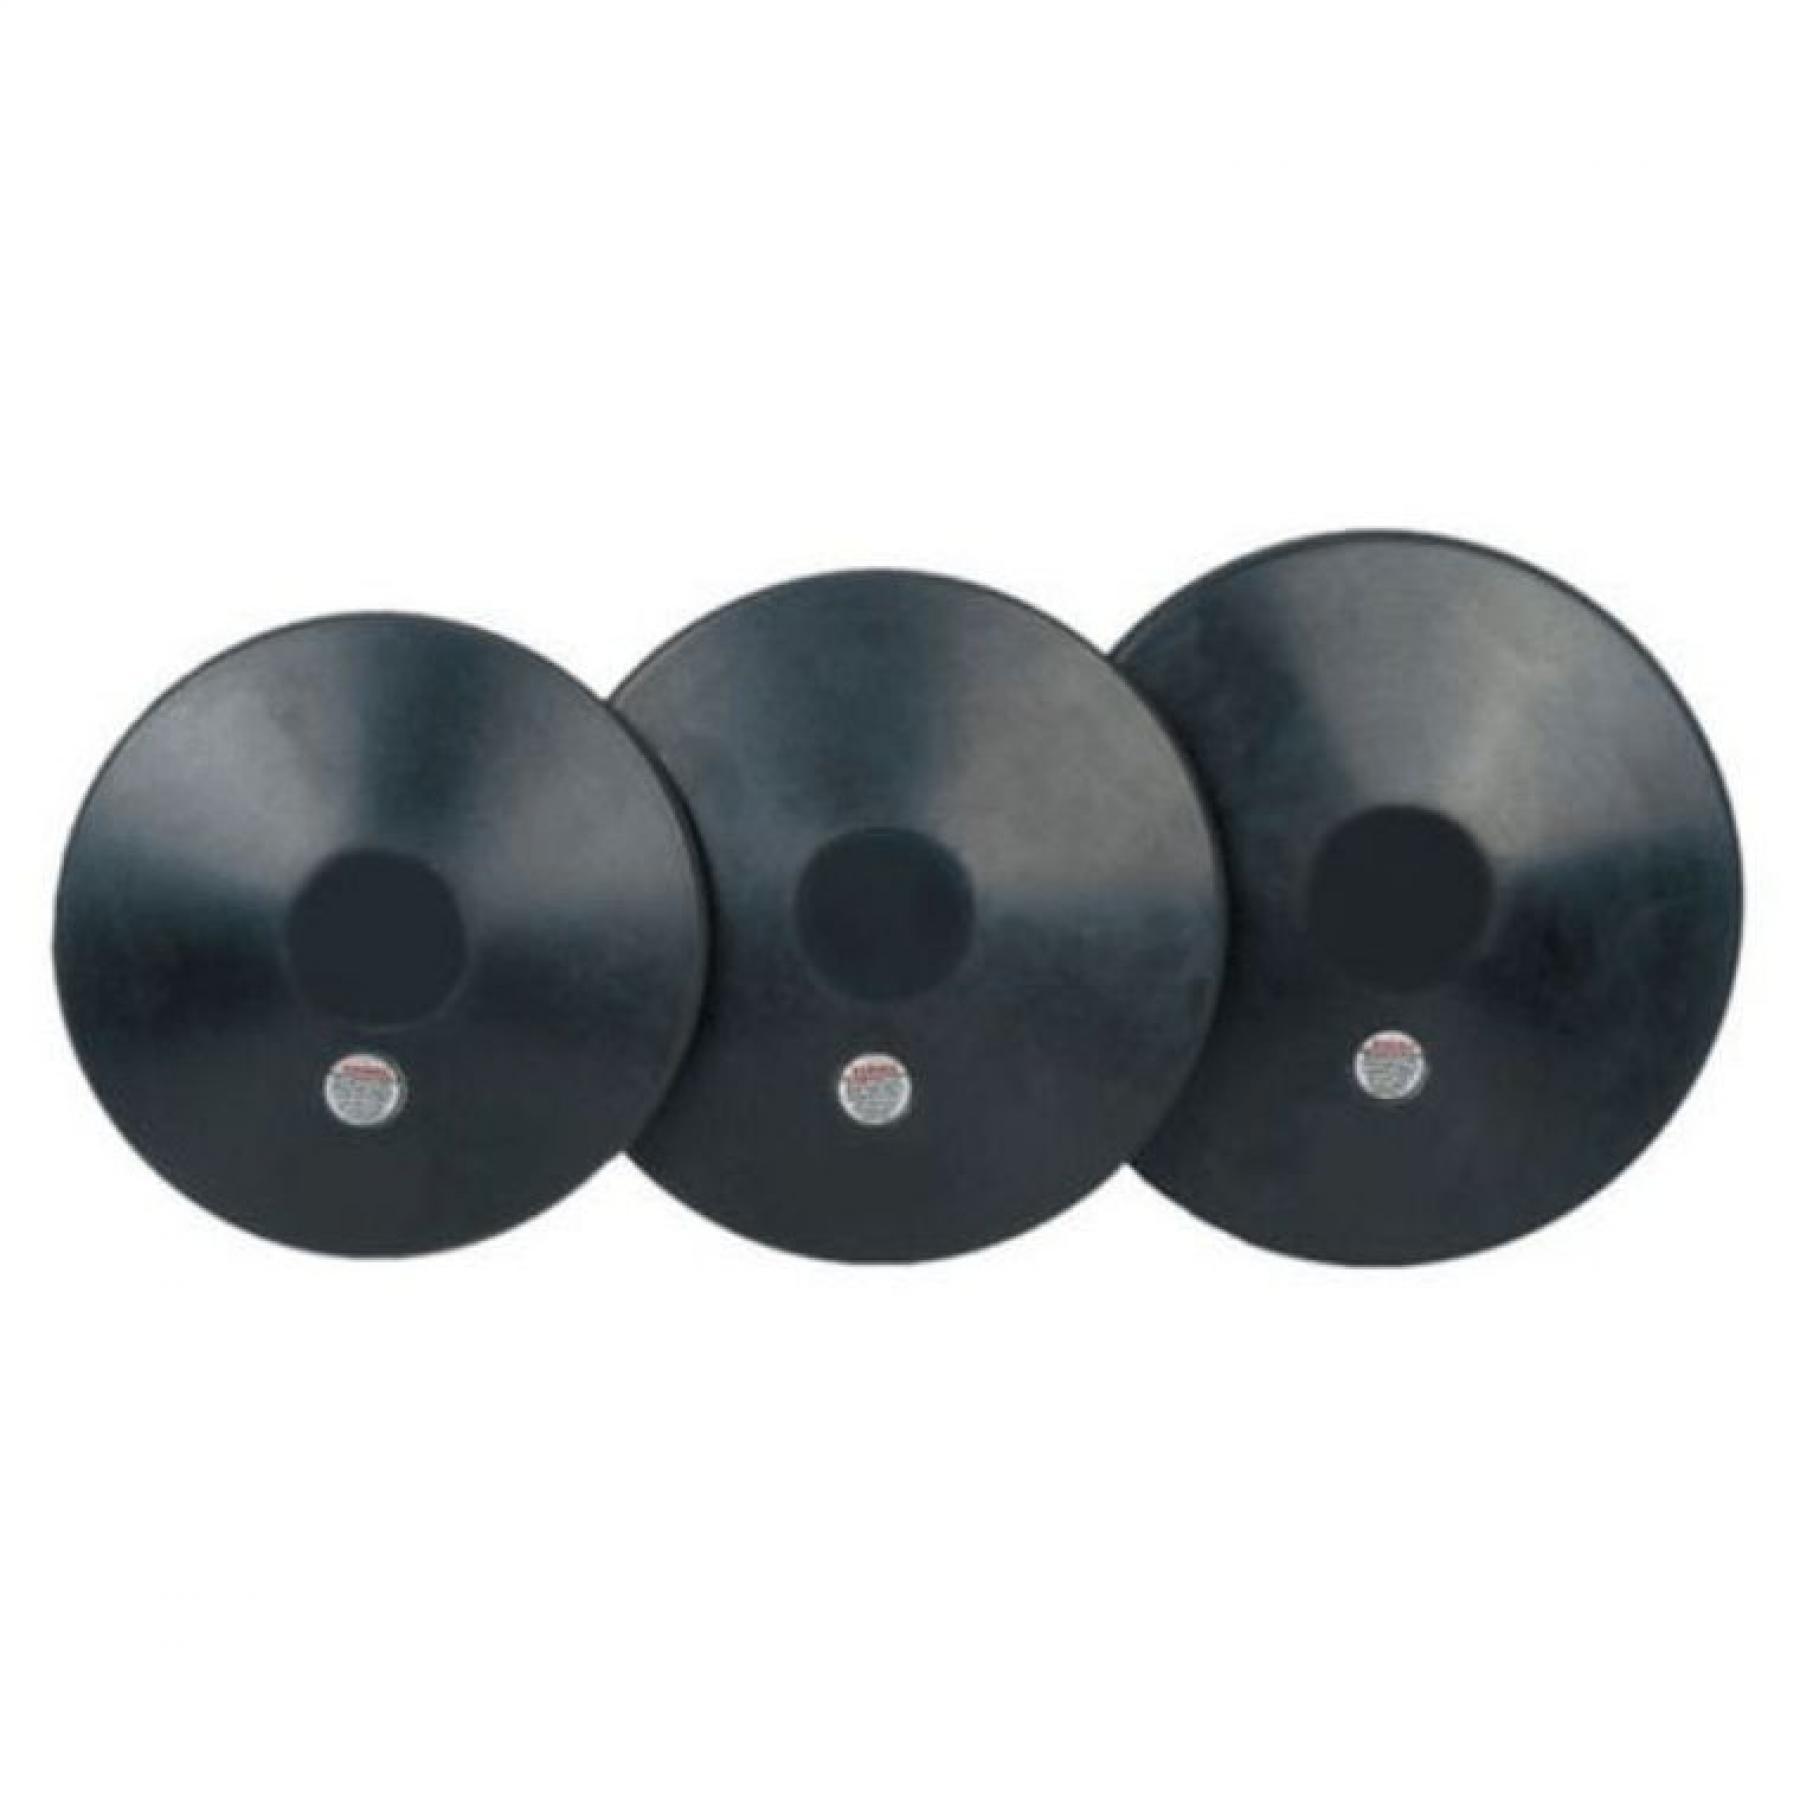 Discus Rubber 2kg